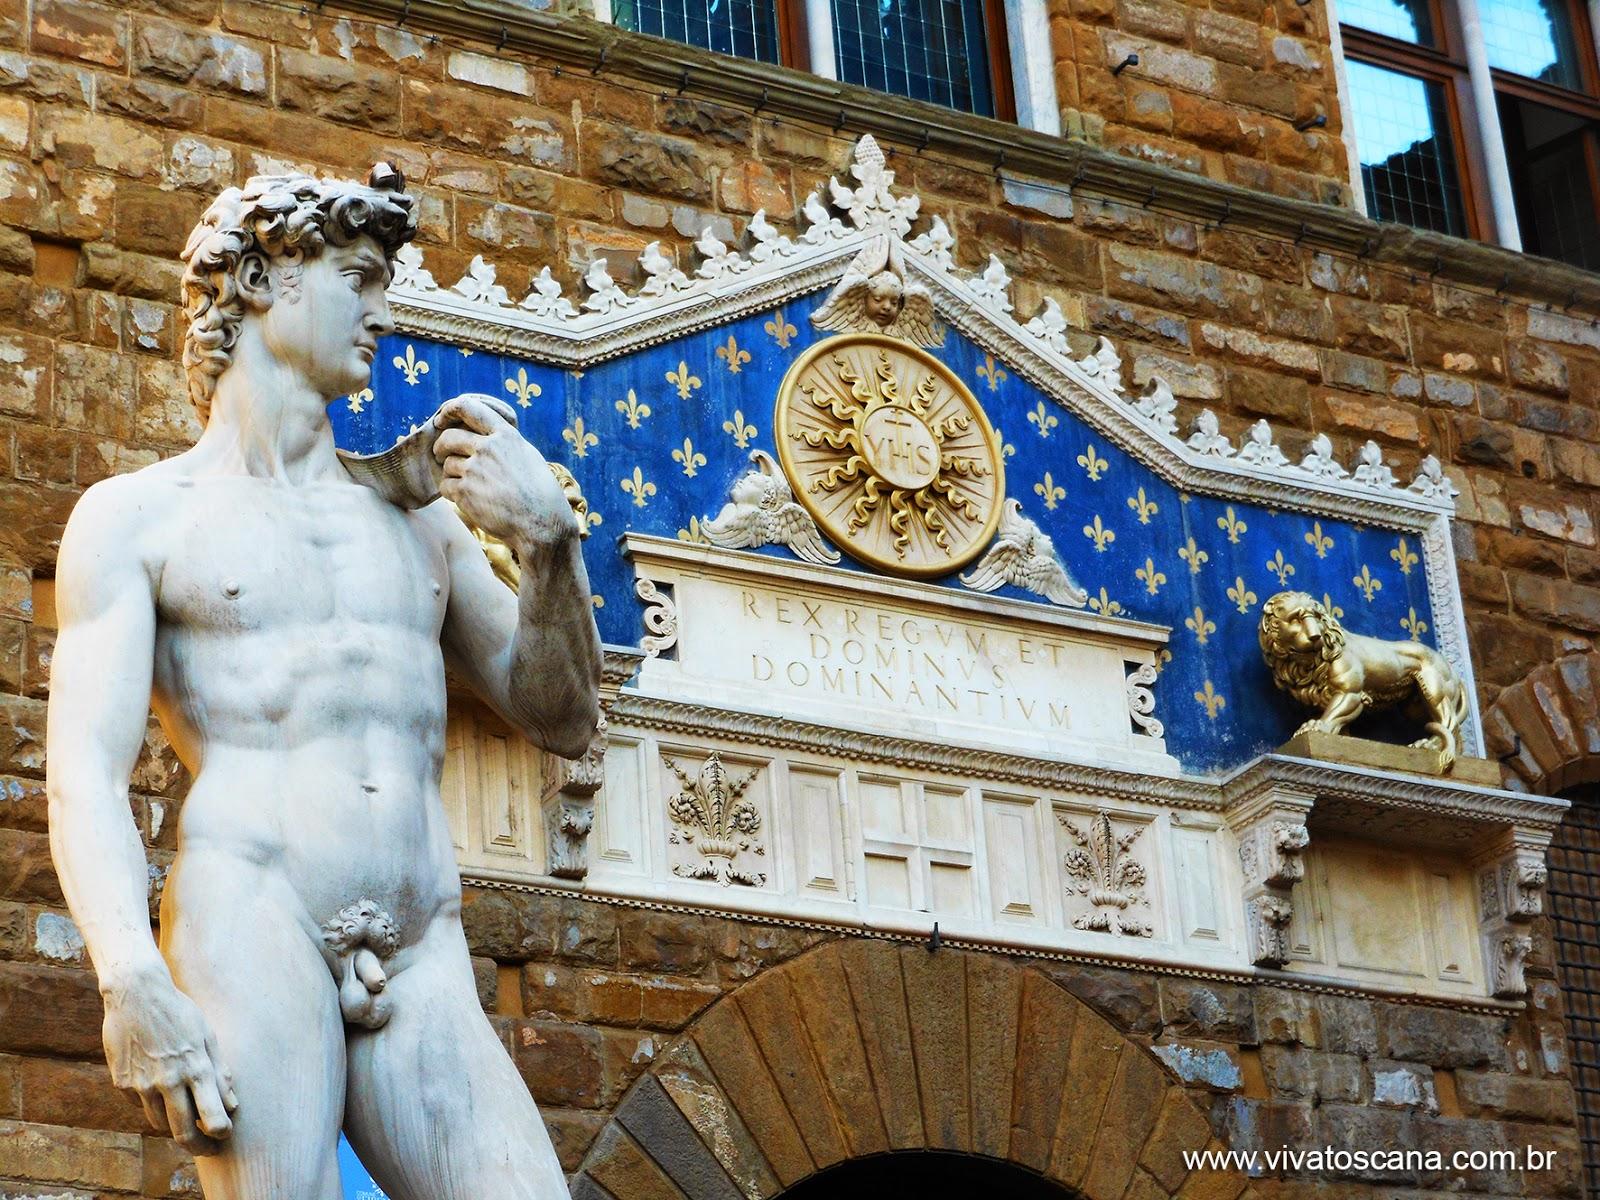 Viva italia 5 - 2 part 9